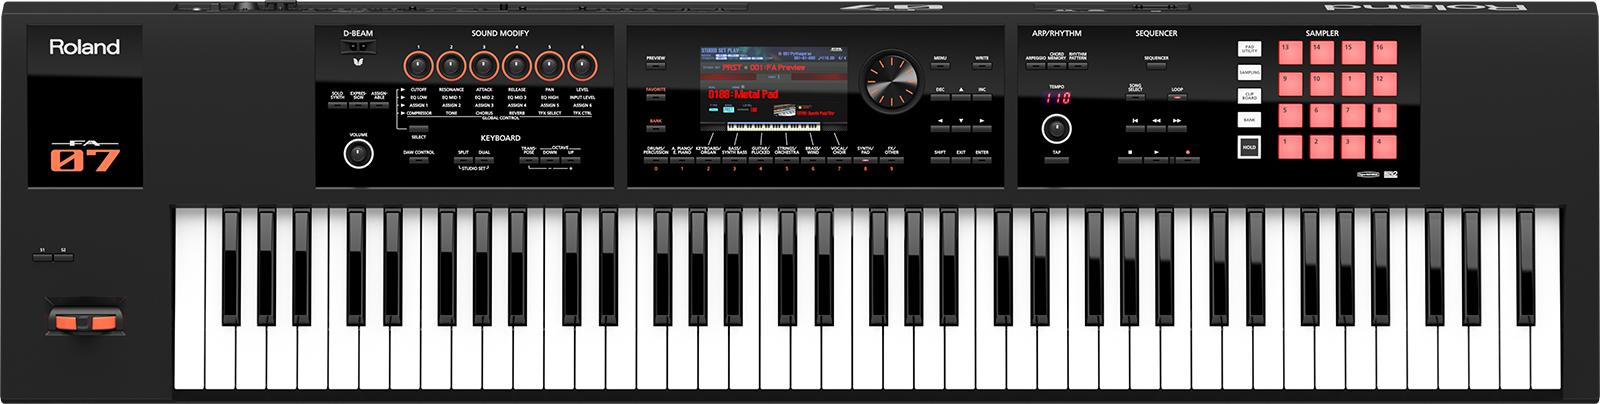 Roland ローランド / FA-07 Music Workstation 76鍵盤 シンセサイザー 【横浜店】 (FA07)